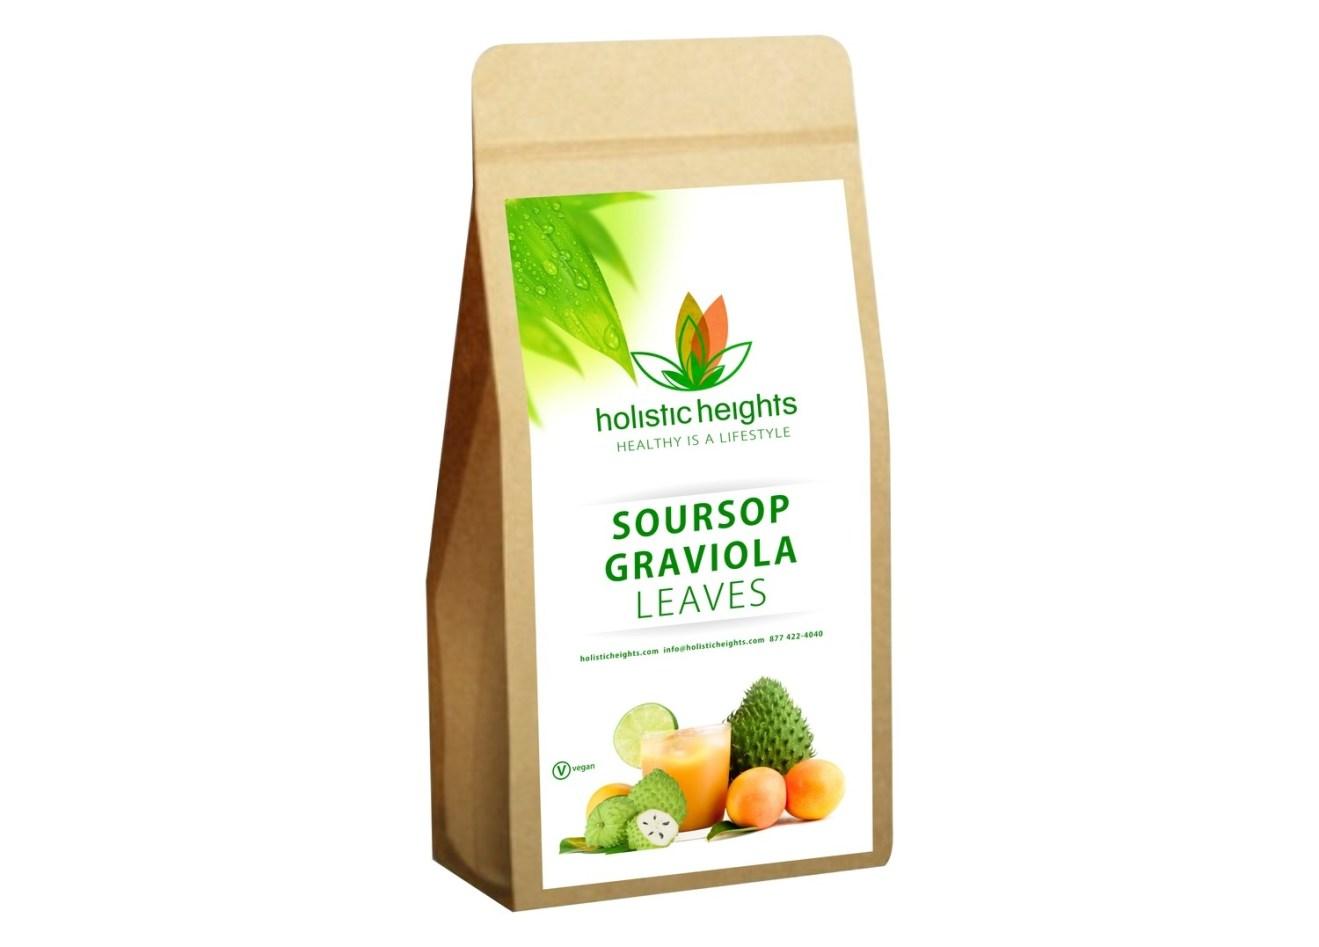 Soursop / Graviola Tea Leaves by Holistic Heights